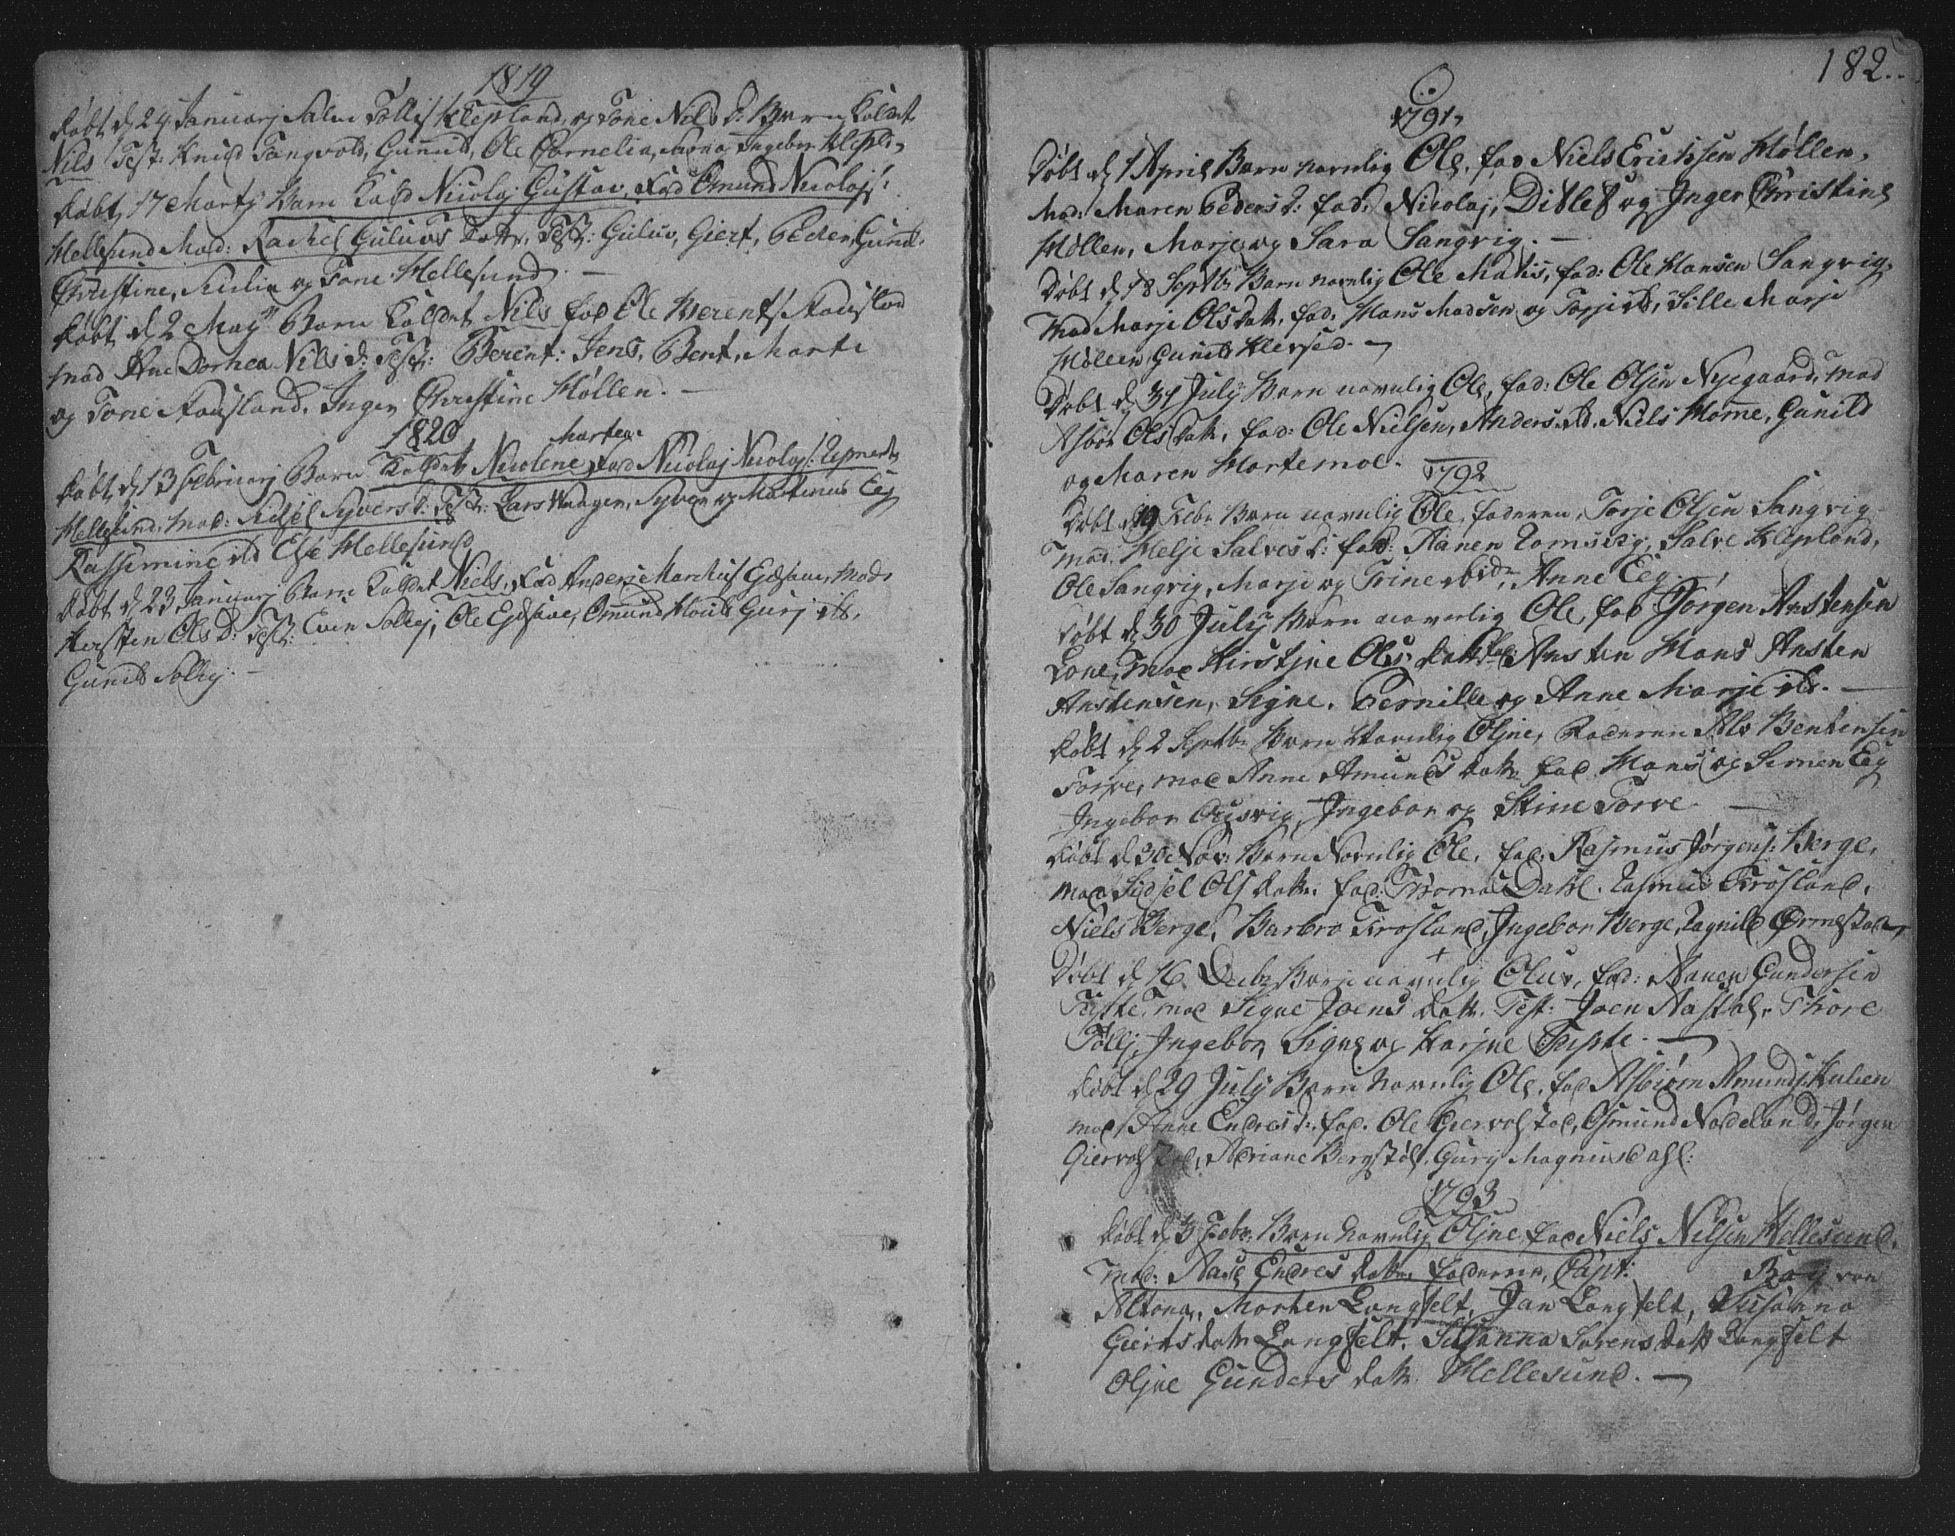 SAK, Søgne sokneprestkontor, F/Fa/Fab/L0005: Ministerialbok nr. A 5, 1791-1820, s. 182